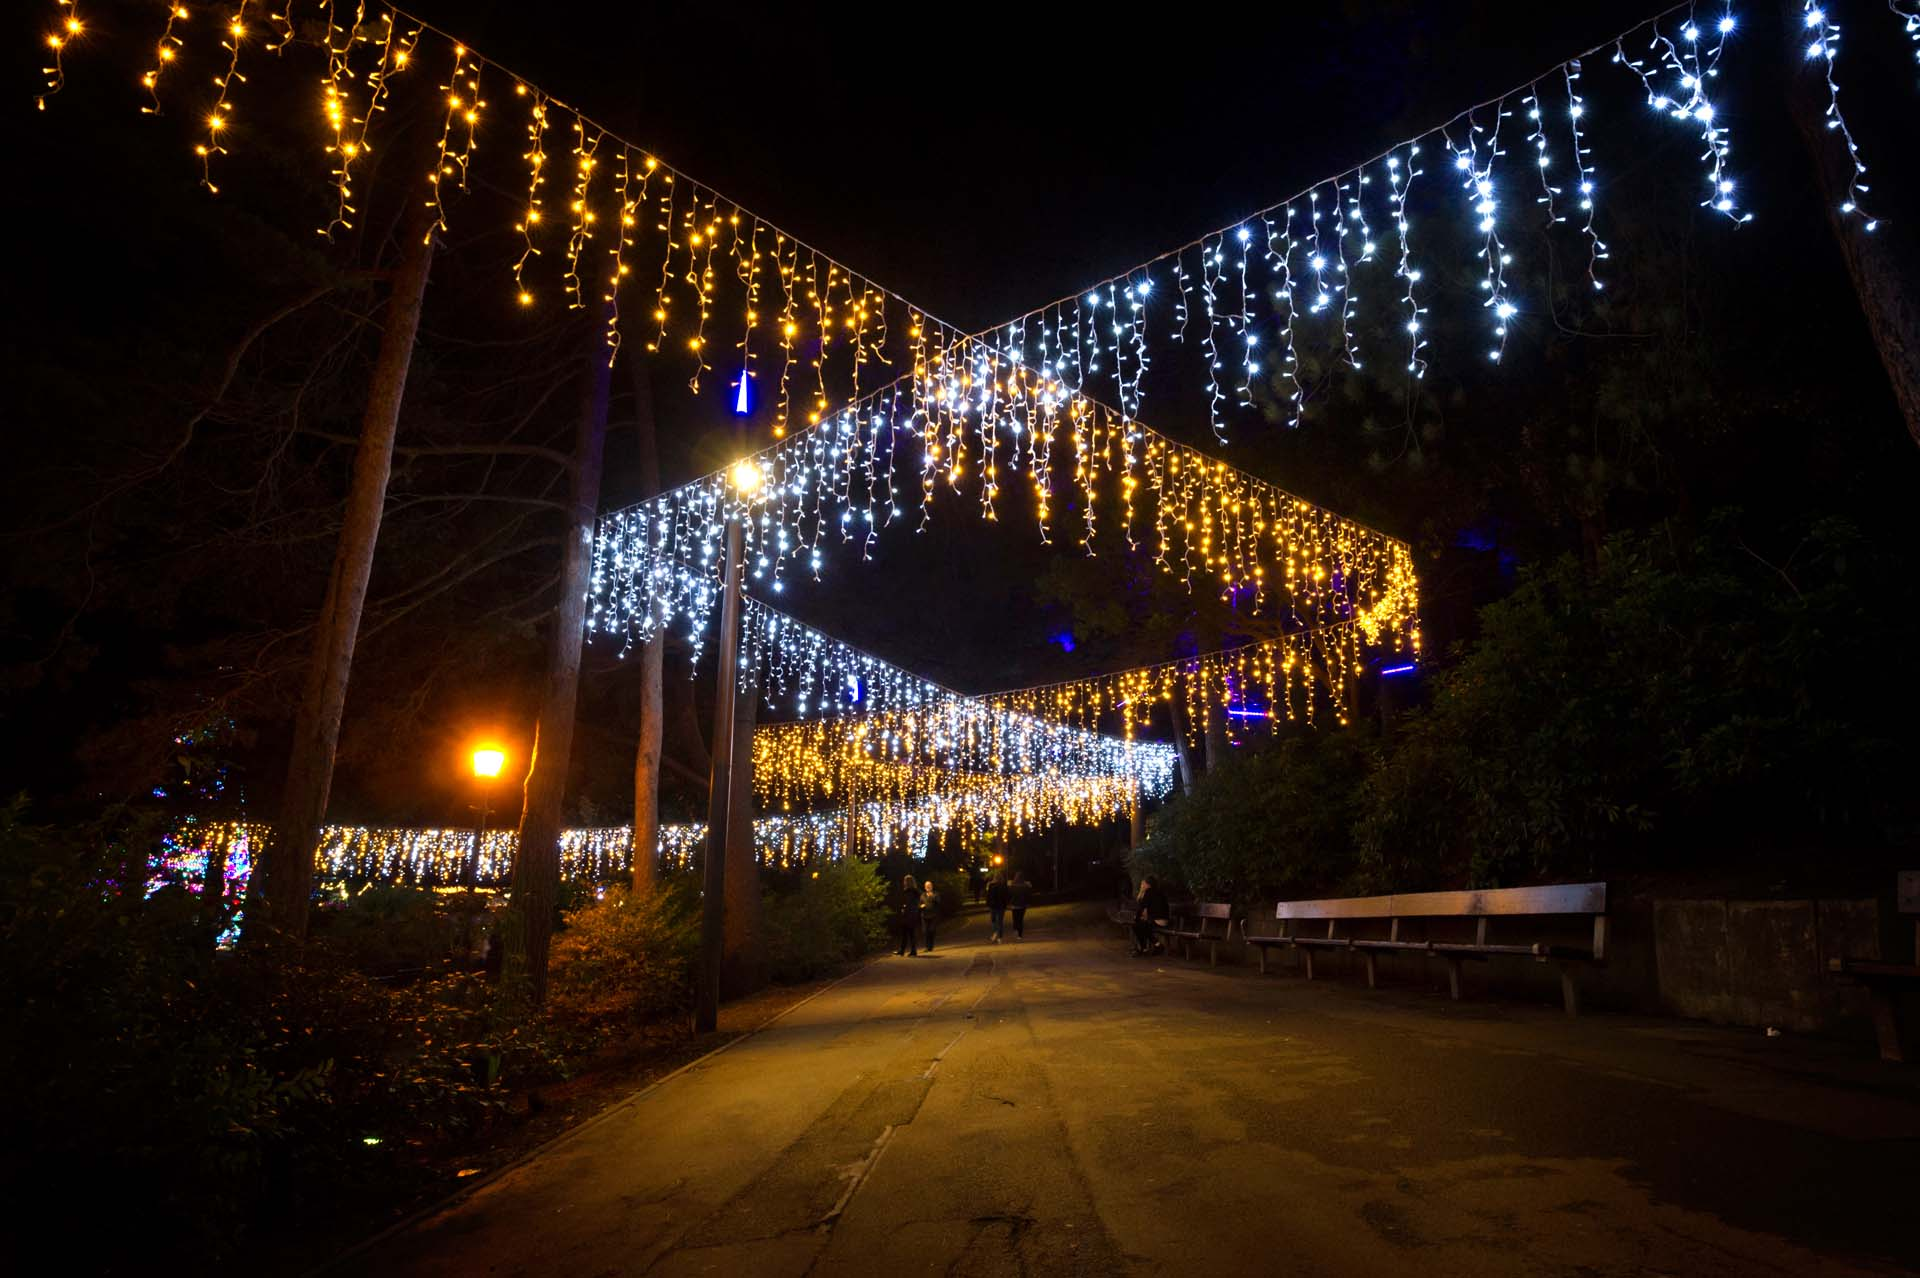 The Pinewalk lights at night